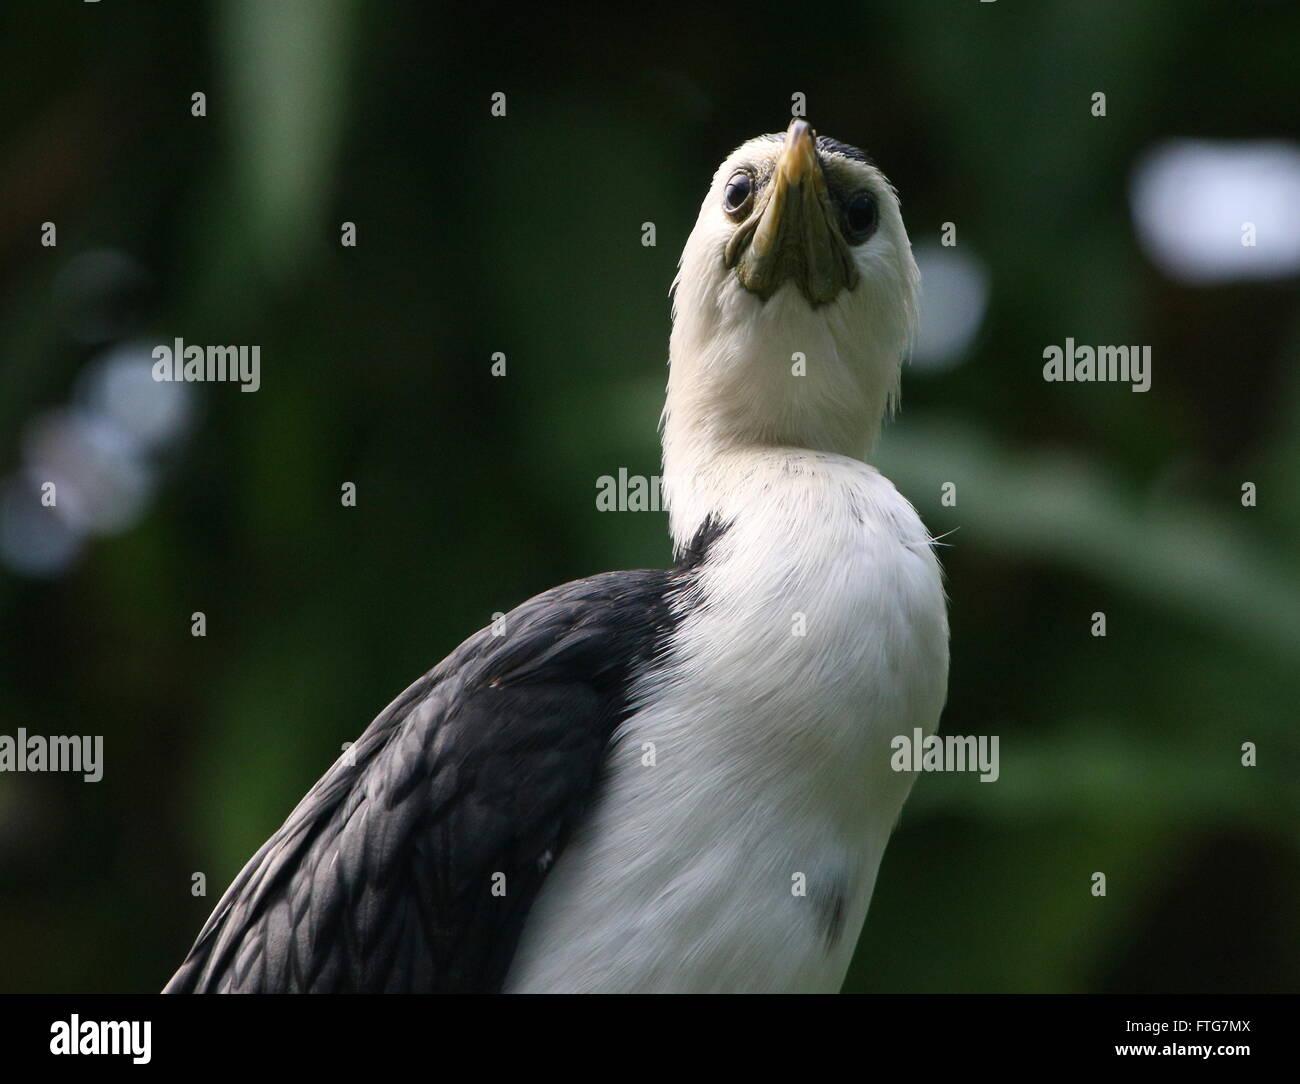 Australasian Little Pied Cormorant or Little shag (Microcarbo melanoleucos, formerly Phalacrocorax melanoleucos) - Stock Image